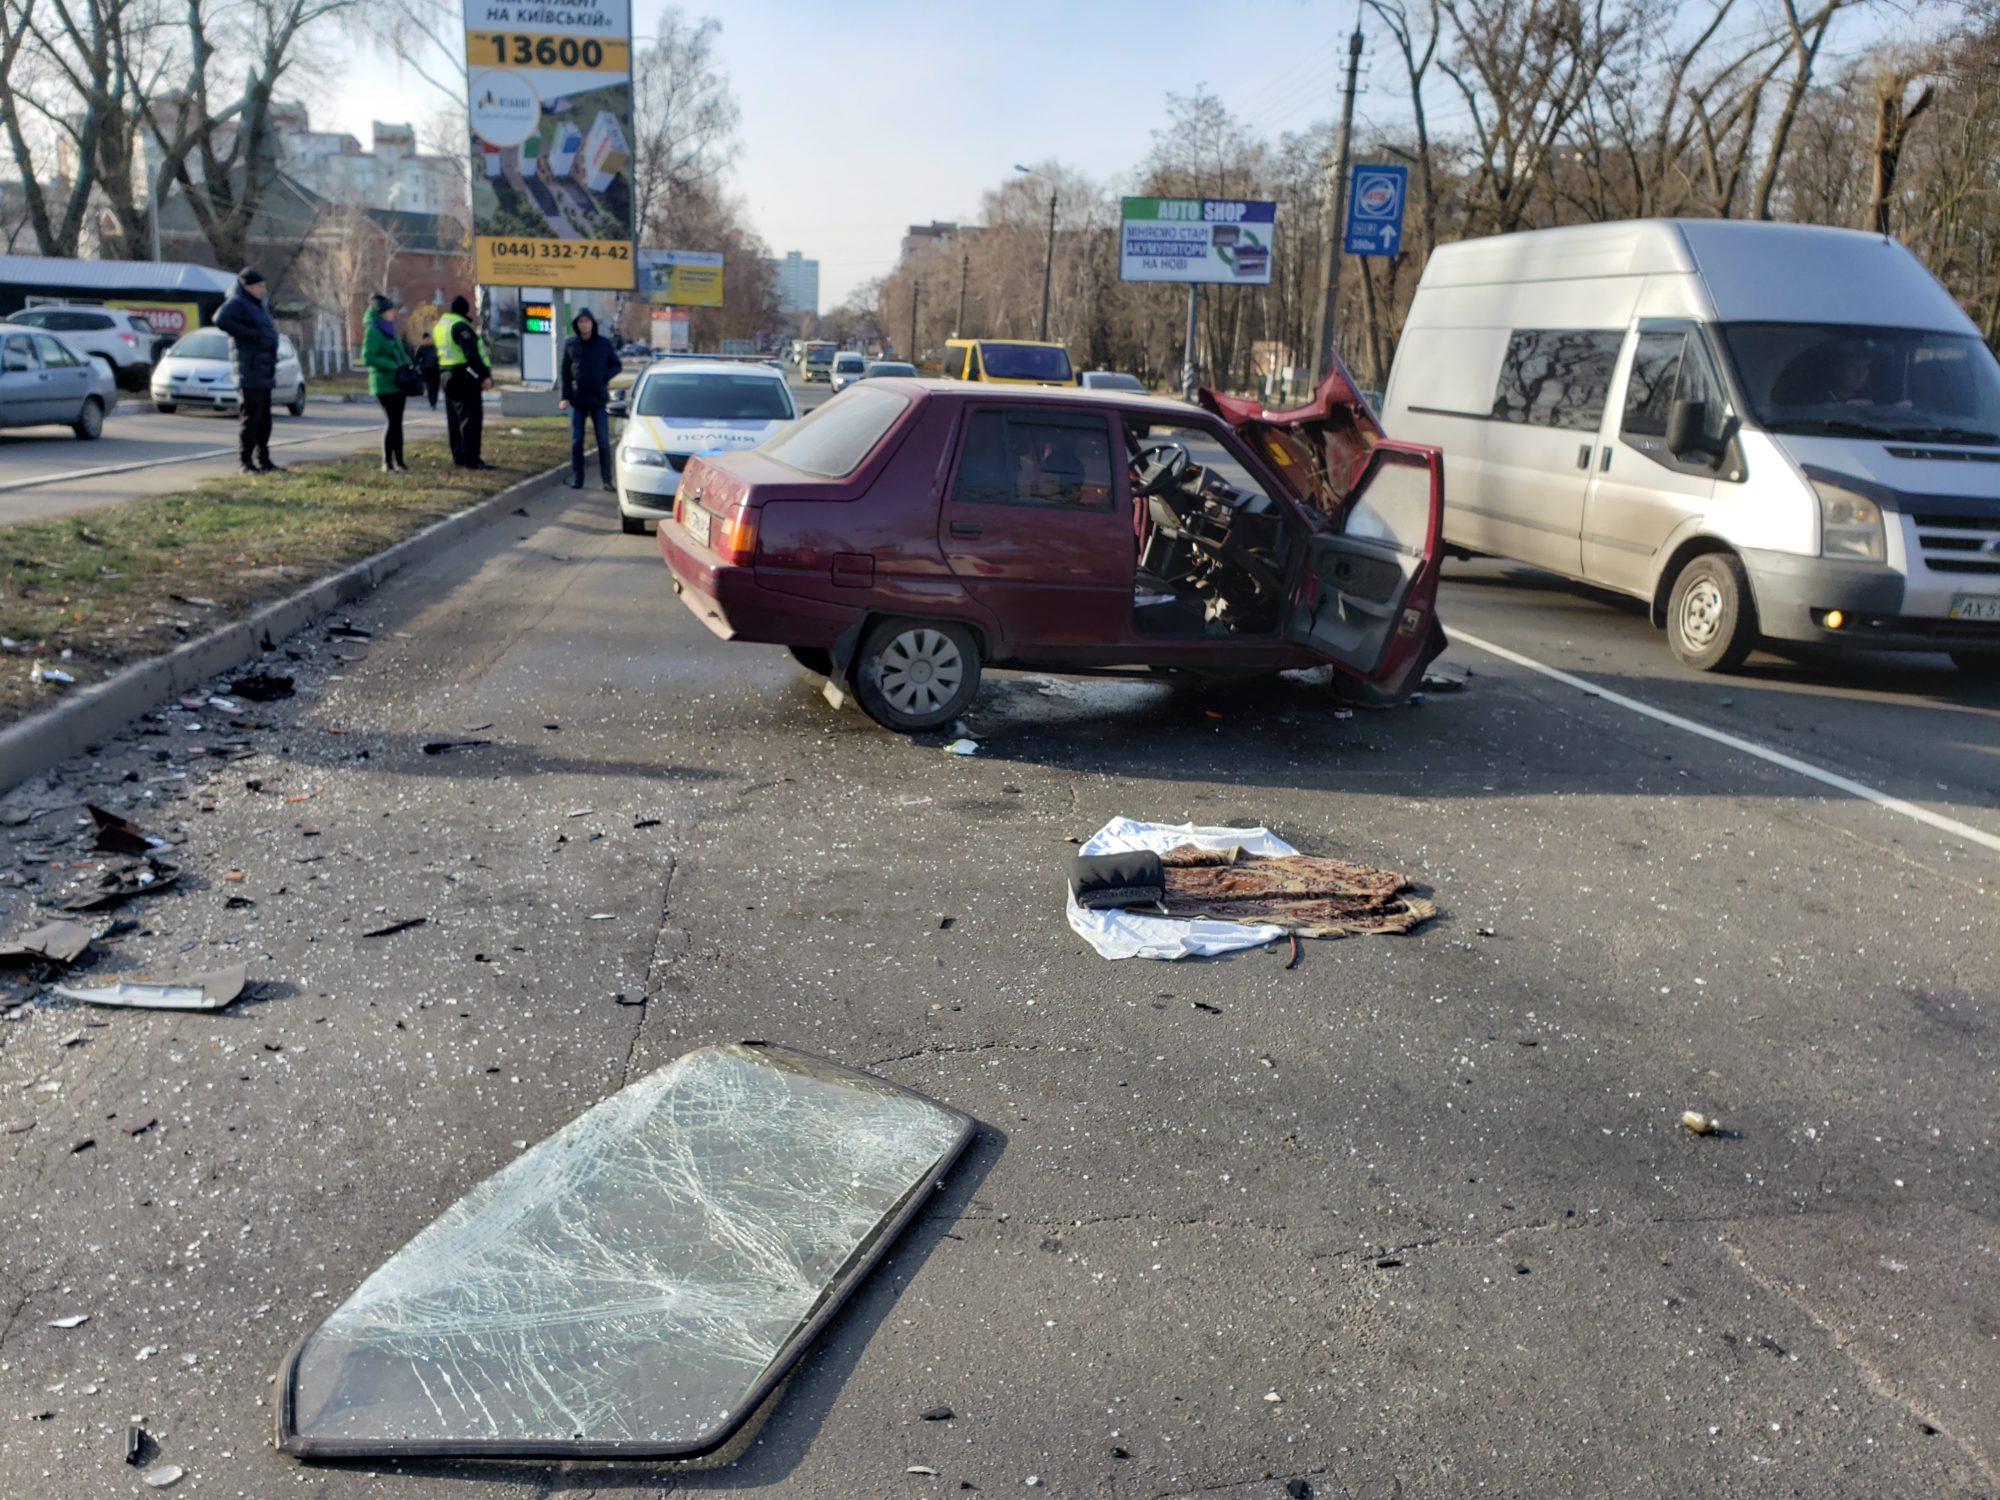 20191123_112859-2000x1500 Славута&Mercedes: у Броварах сталася ДТП